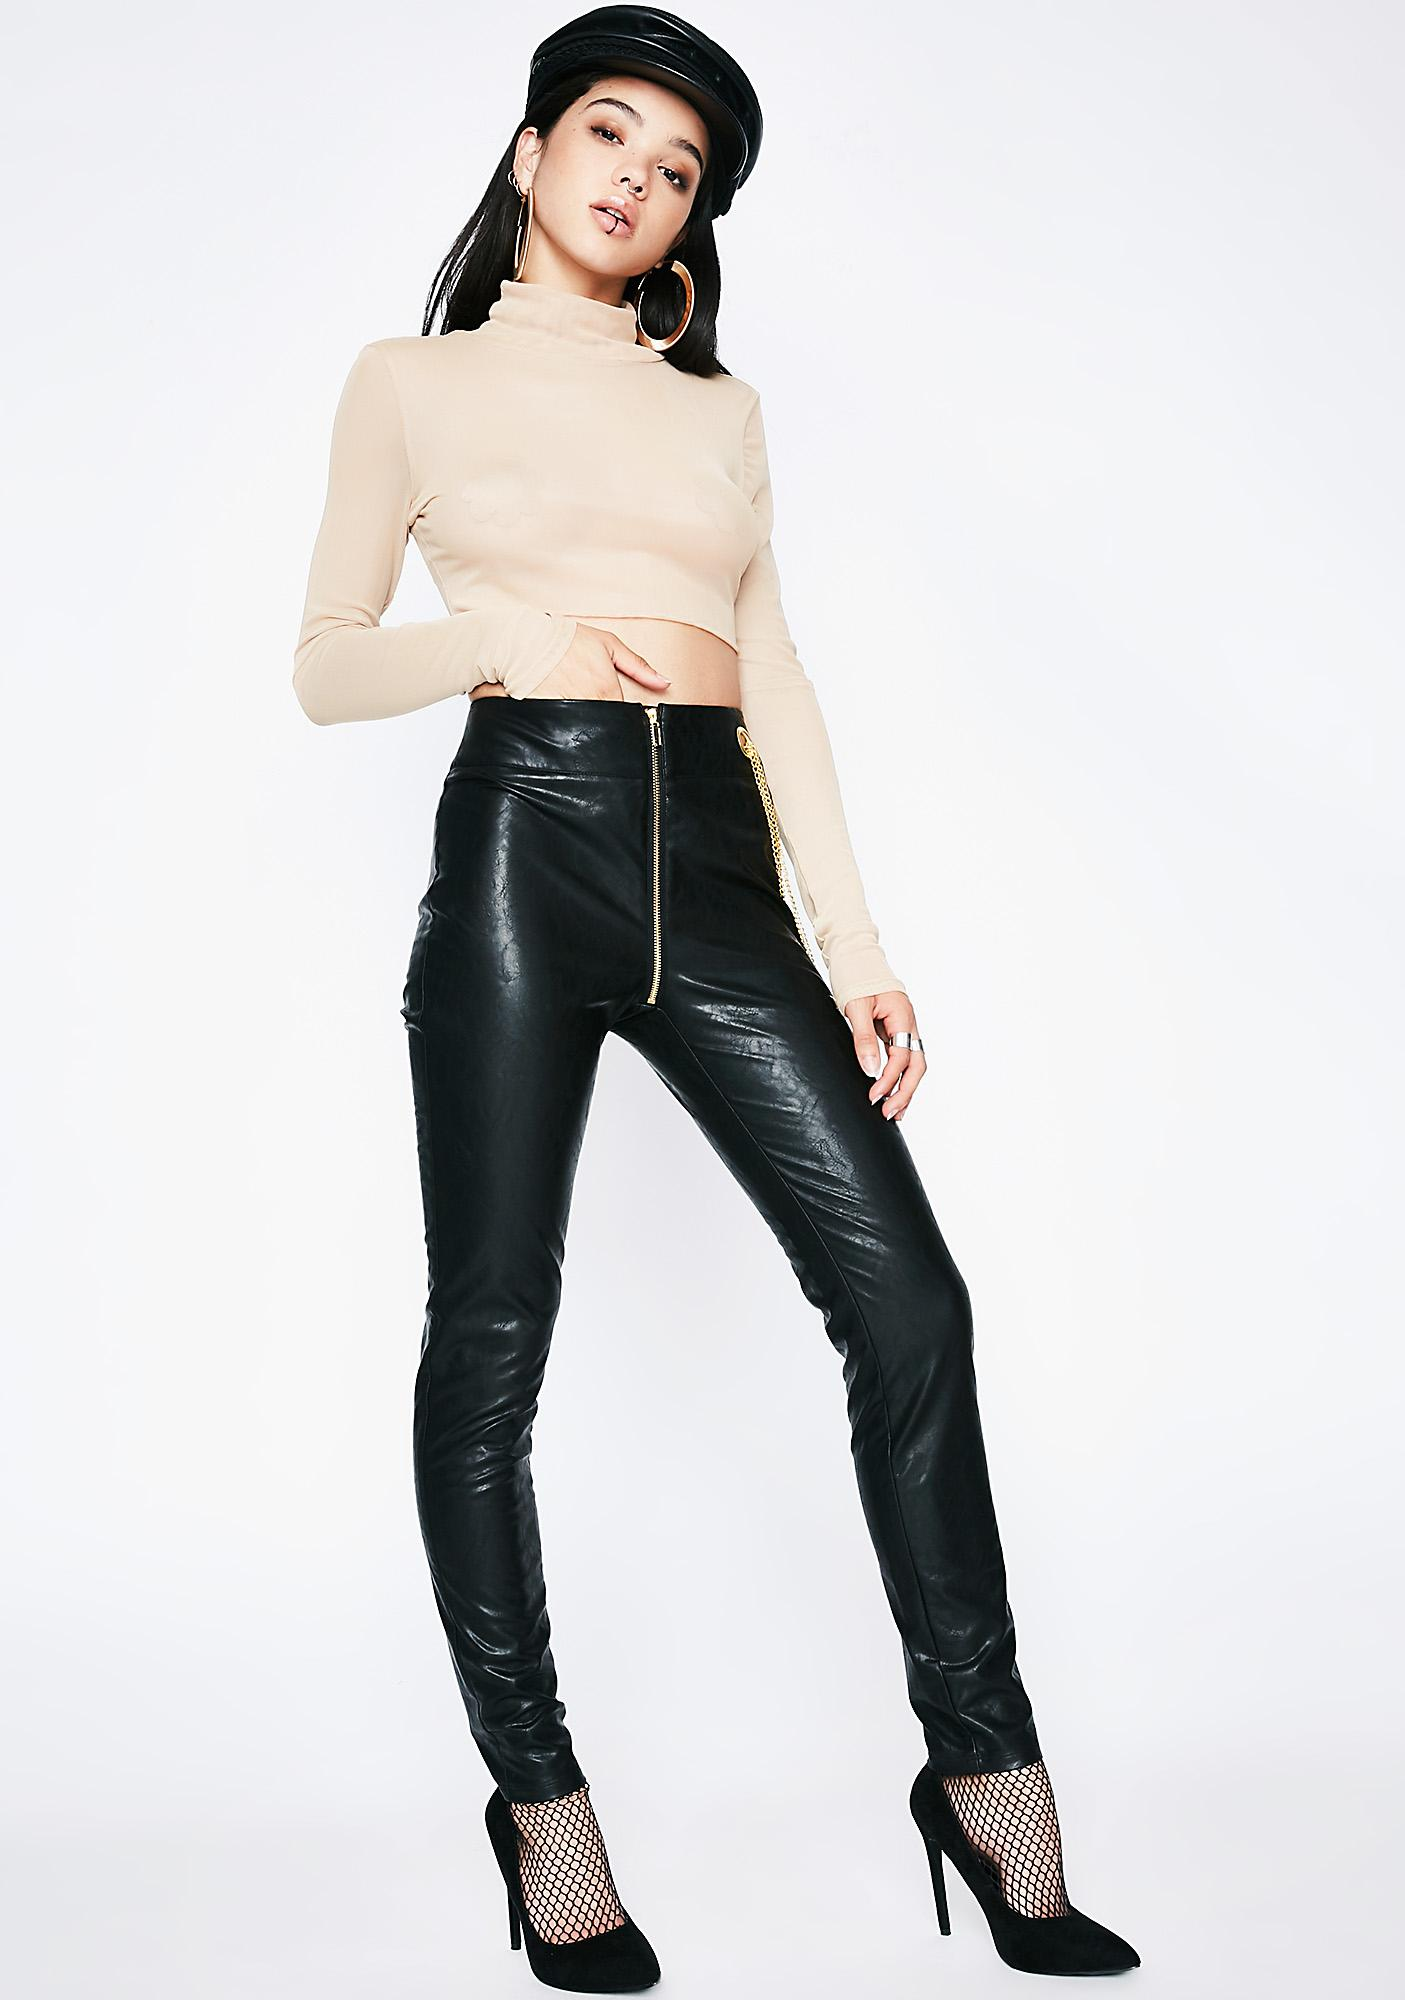 Poster Grl Hit Em' Up Style Skinny Pants